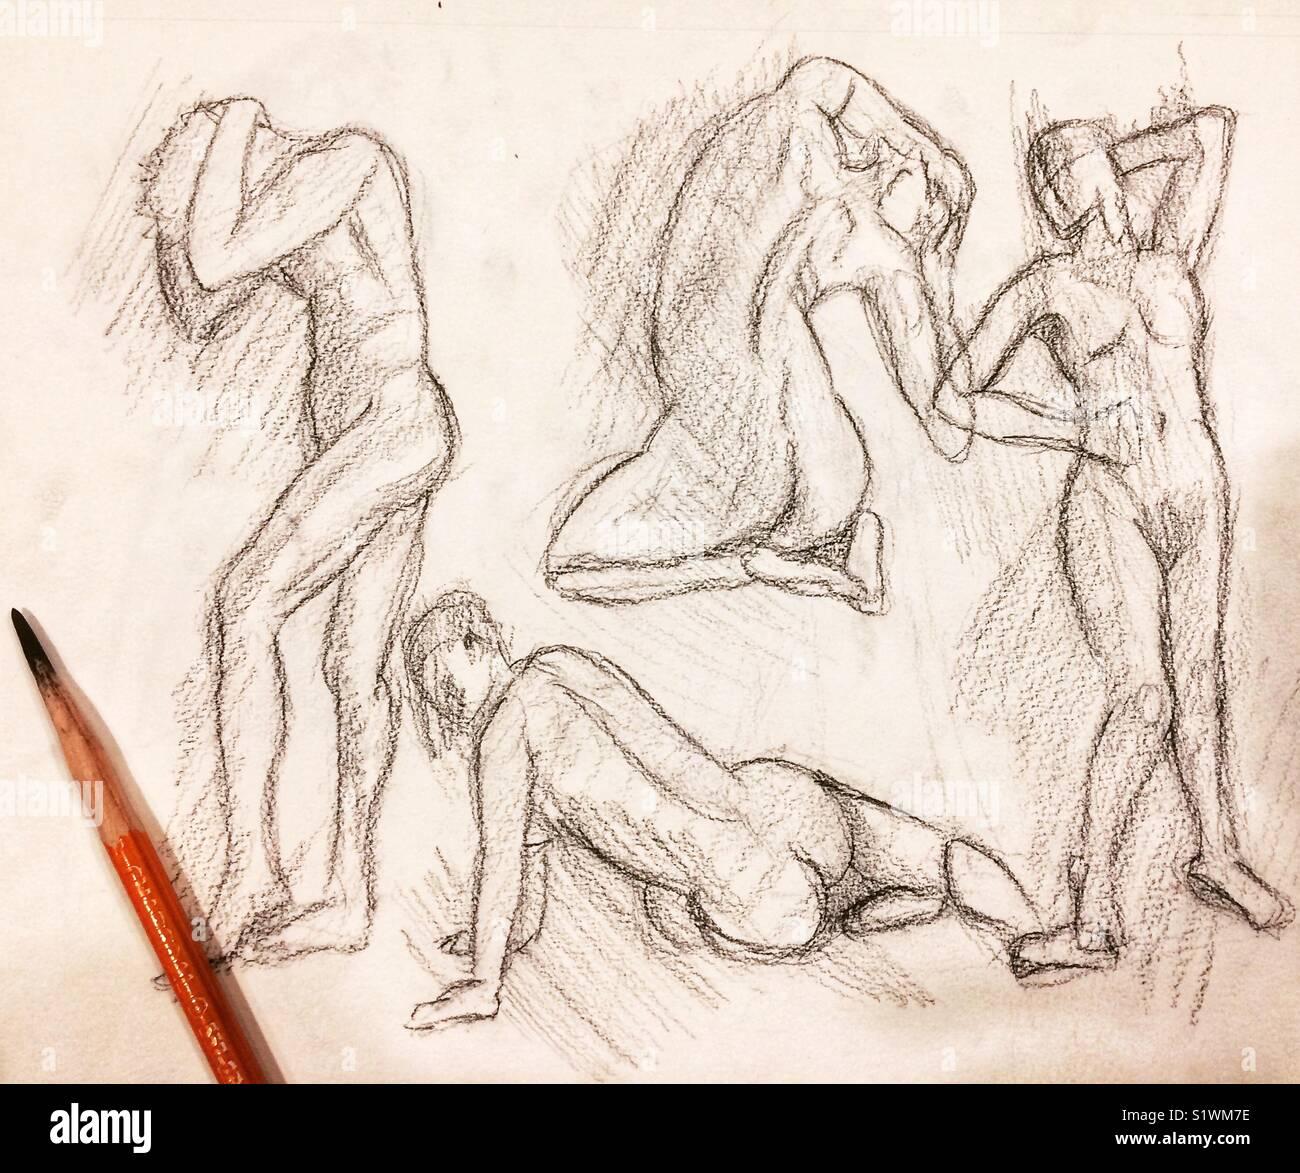 Figure drawing art study charcoal pencil sketch